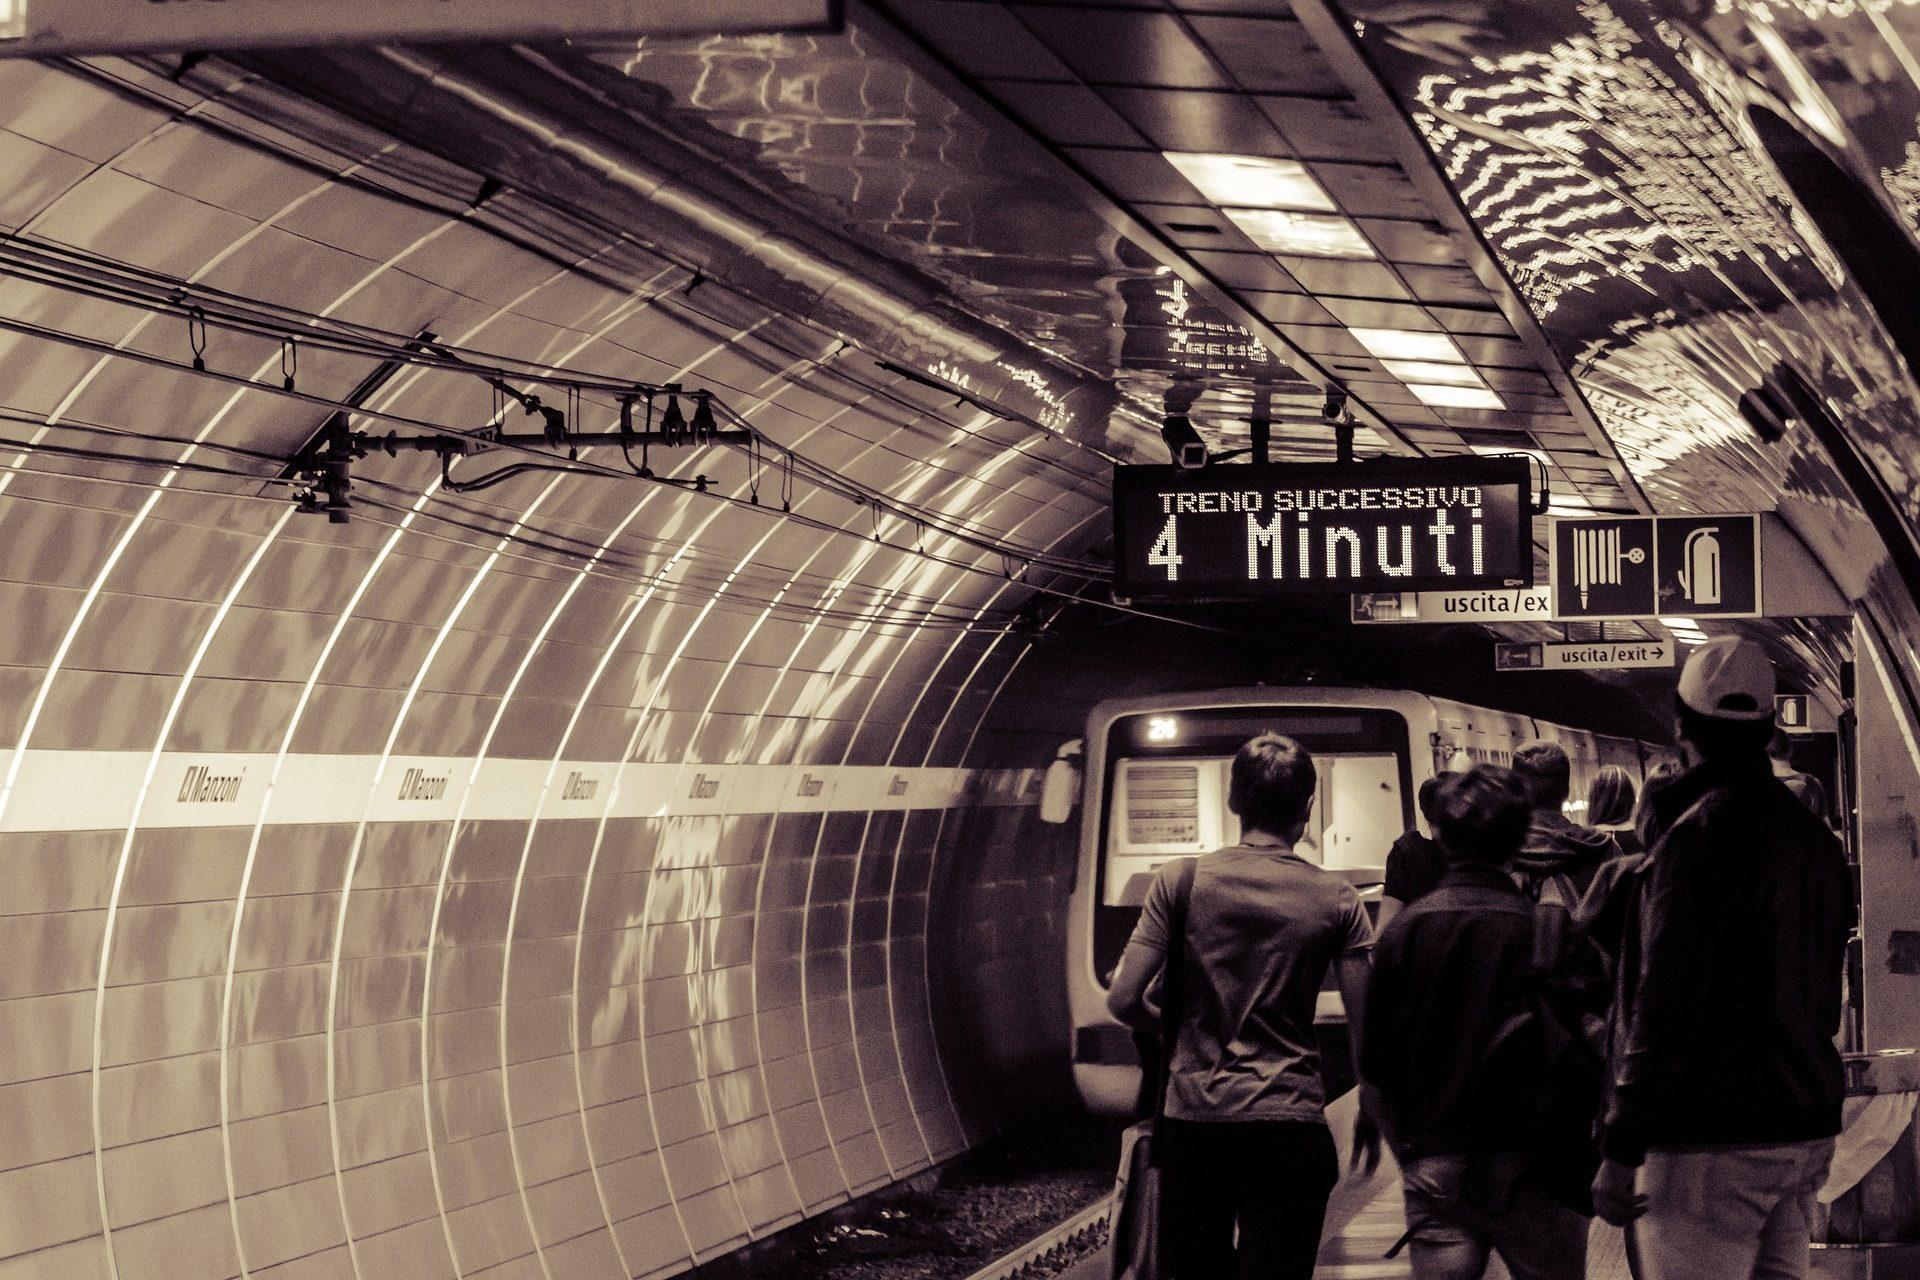 ट्रेन, मेट्रो, स्टेशन, subterránea, उपनगरीय, सुरंग - HD वॉलपेपर - प्रोफेसर-falken.com